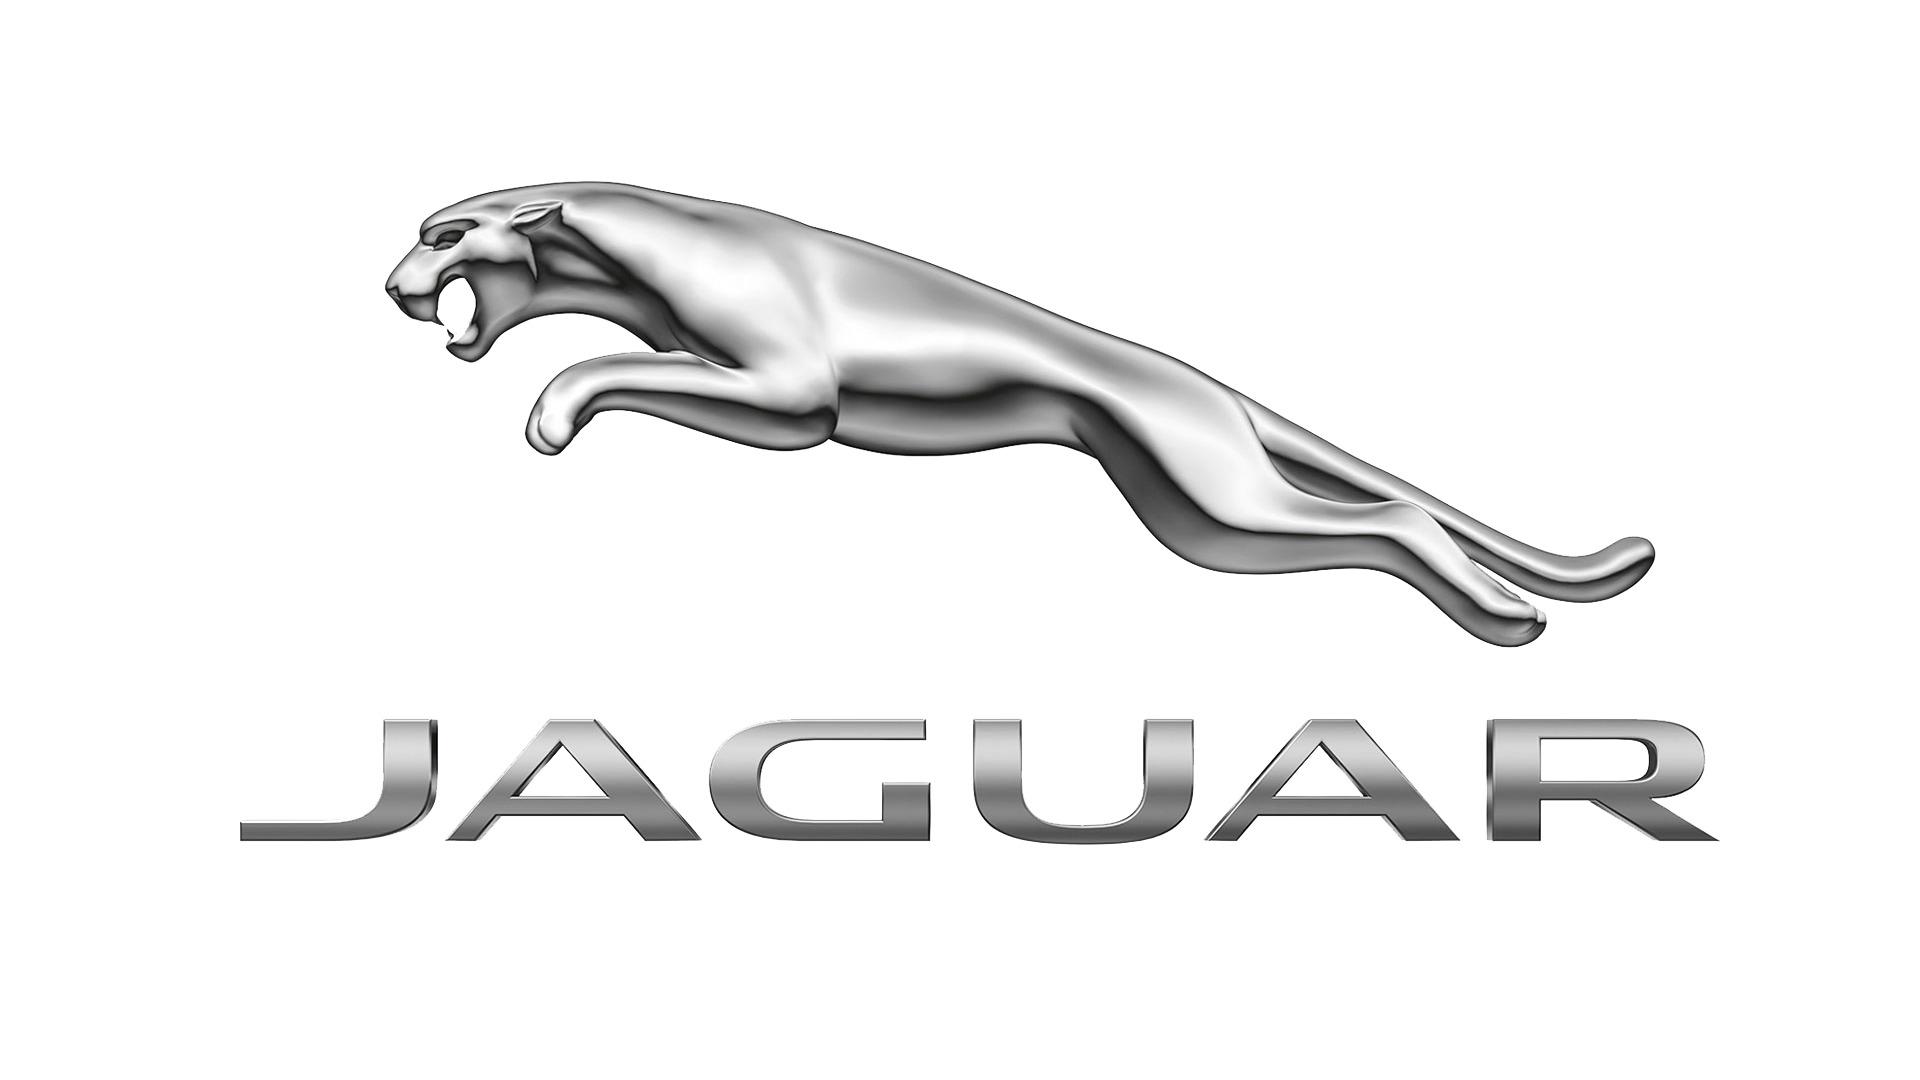 Imagen logo de Jaguar